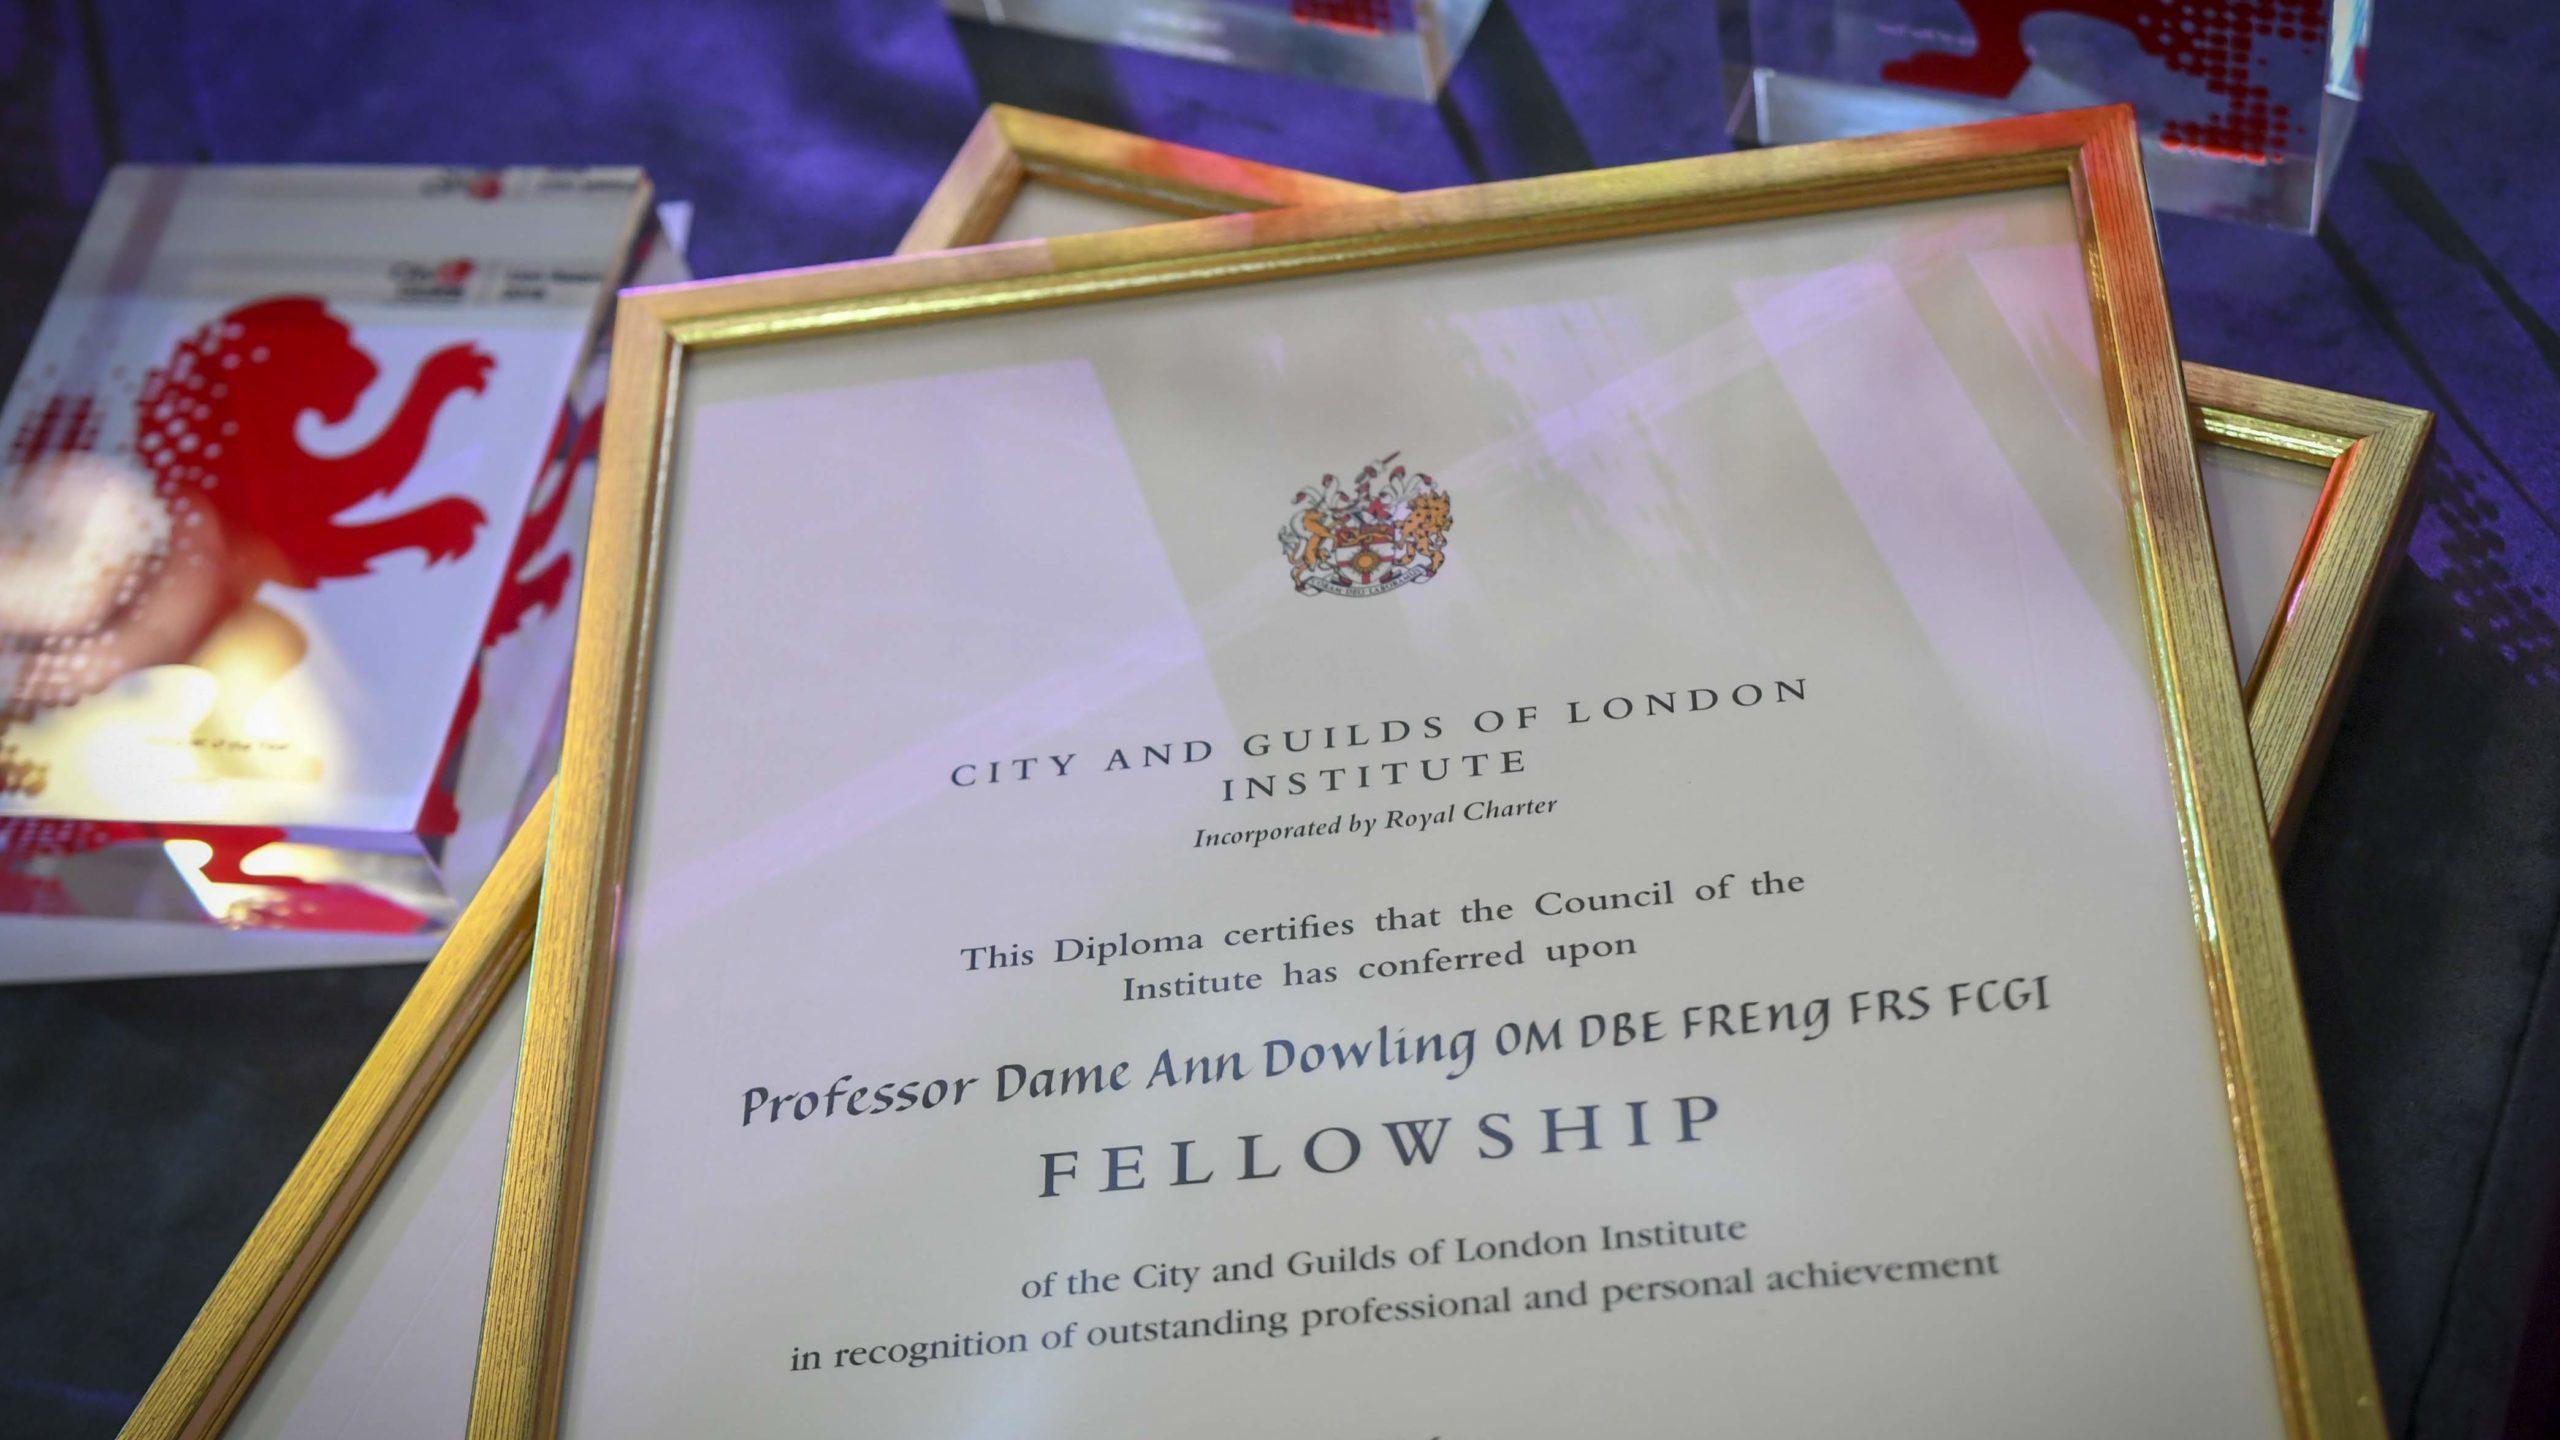 City & Guilds Fellowship Certificates